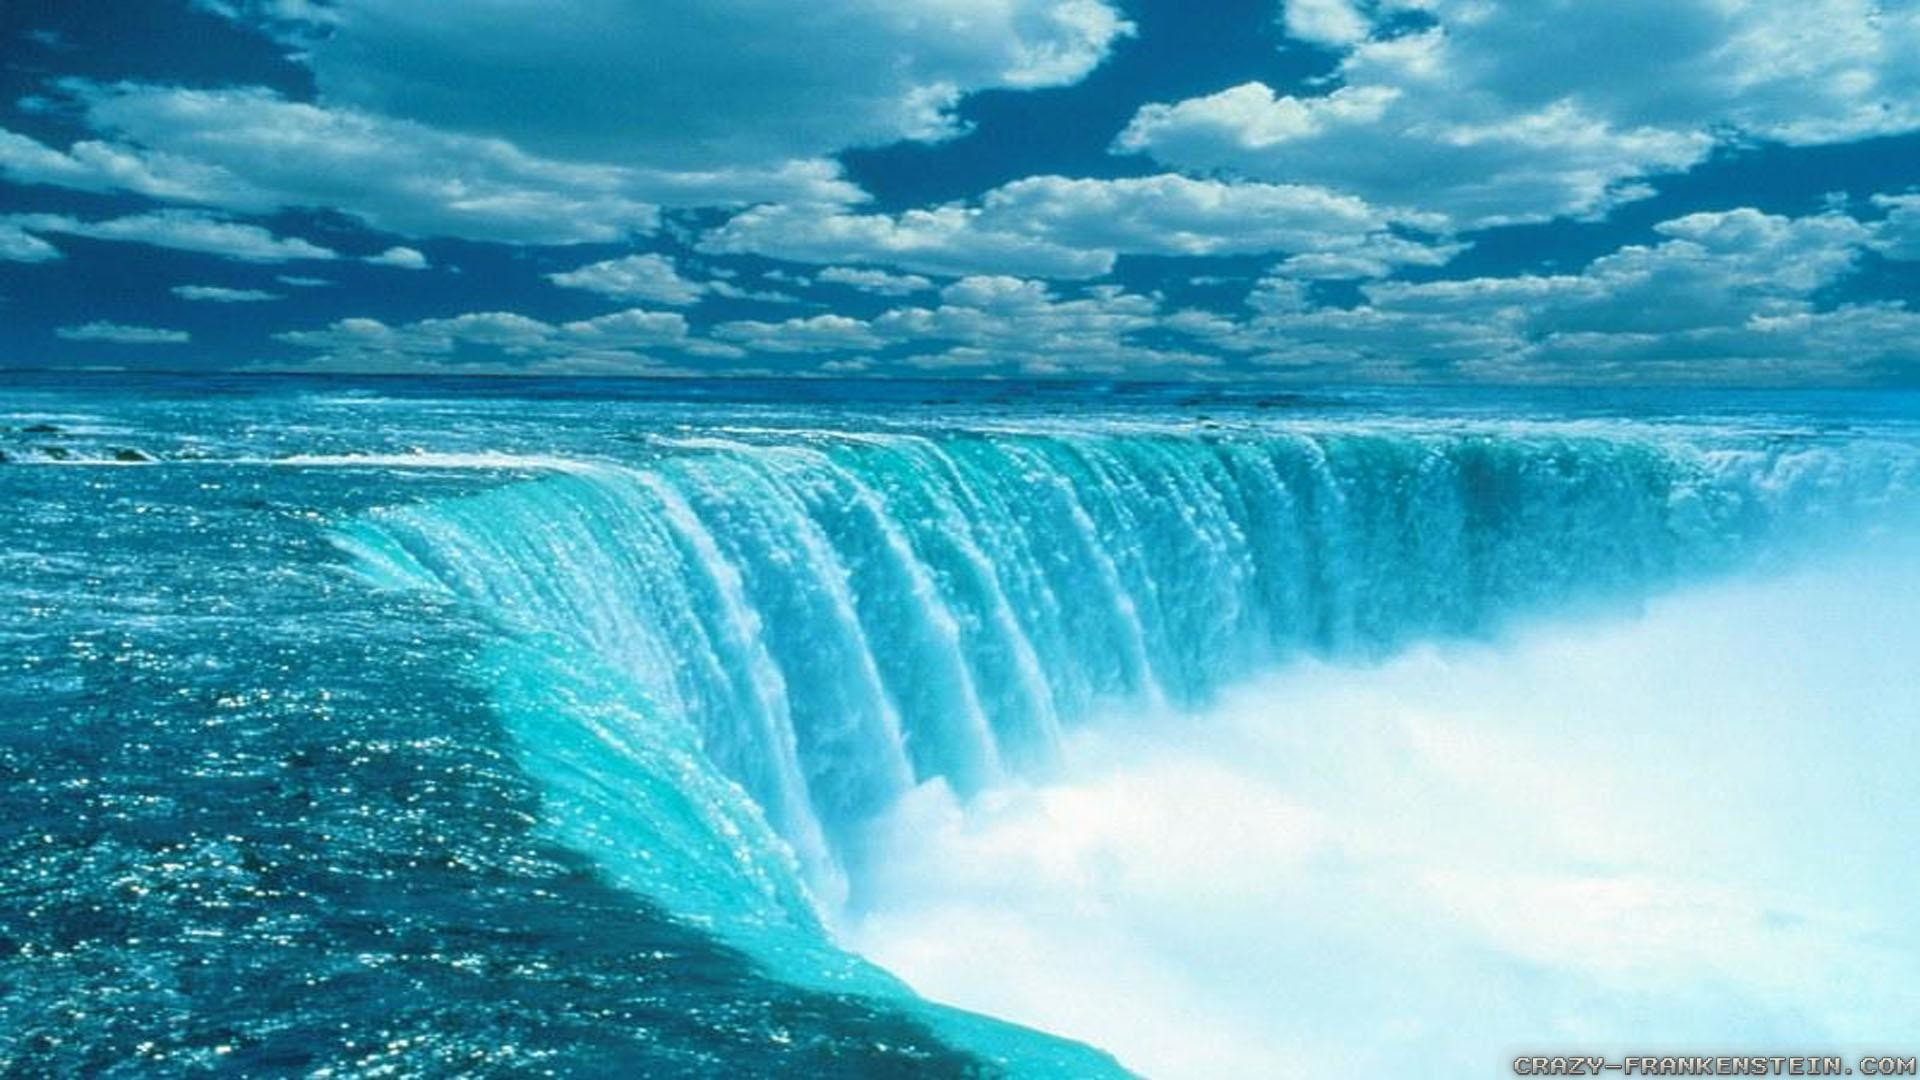 Numa Falls Canada Wallpaper Die 102 Besten Sommer Hintergrundbilder Hd 1920x1080